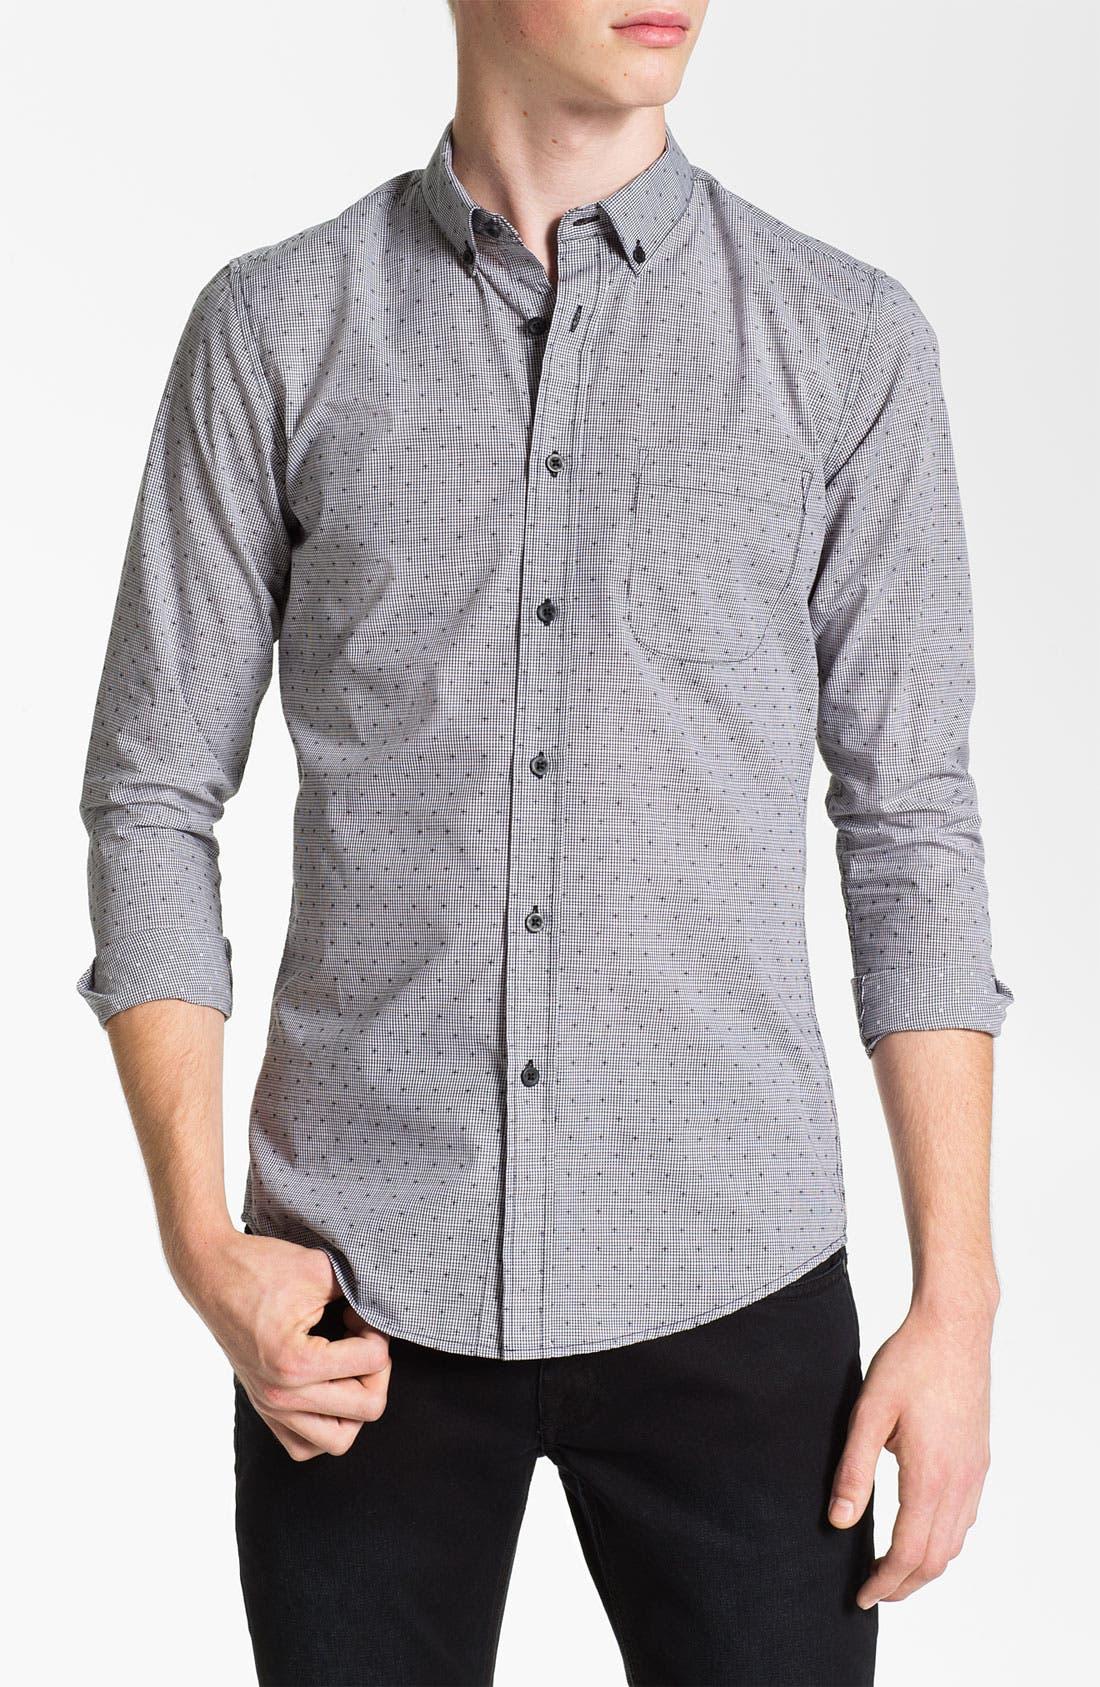 Main Image - Topman Extra Trim Grid Check Shirt